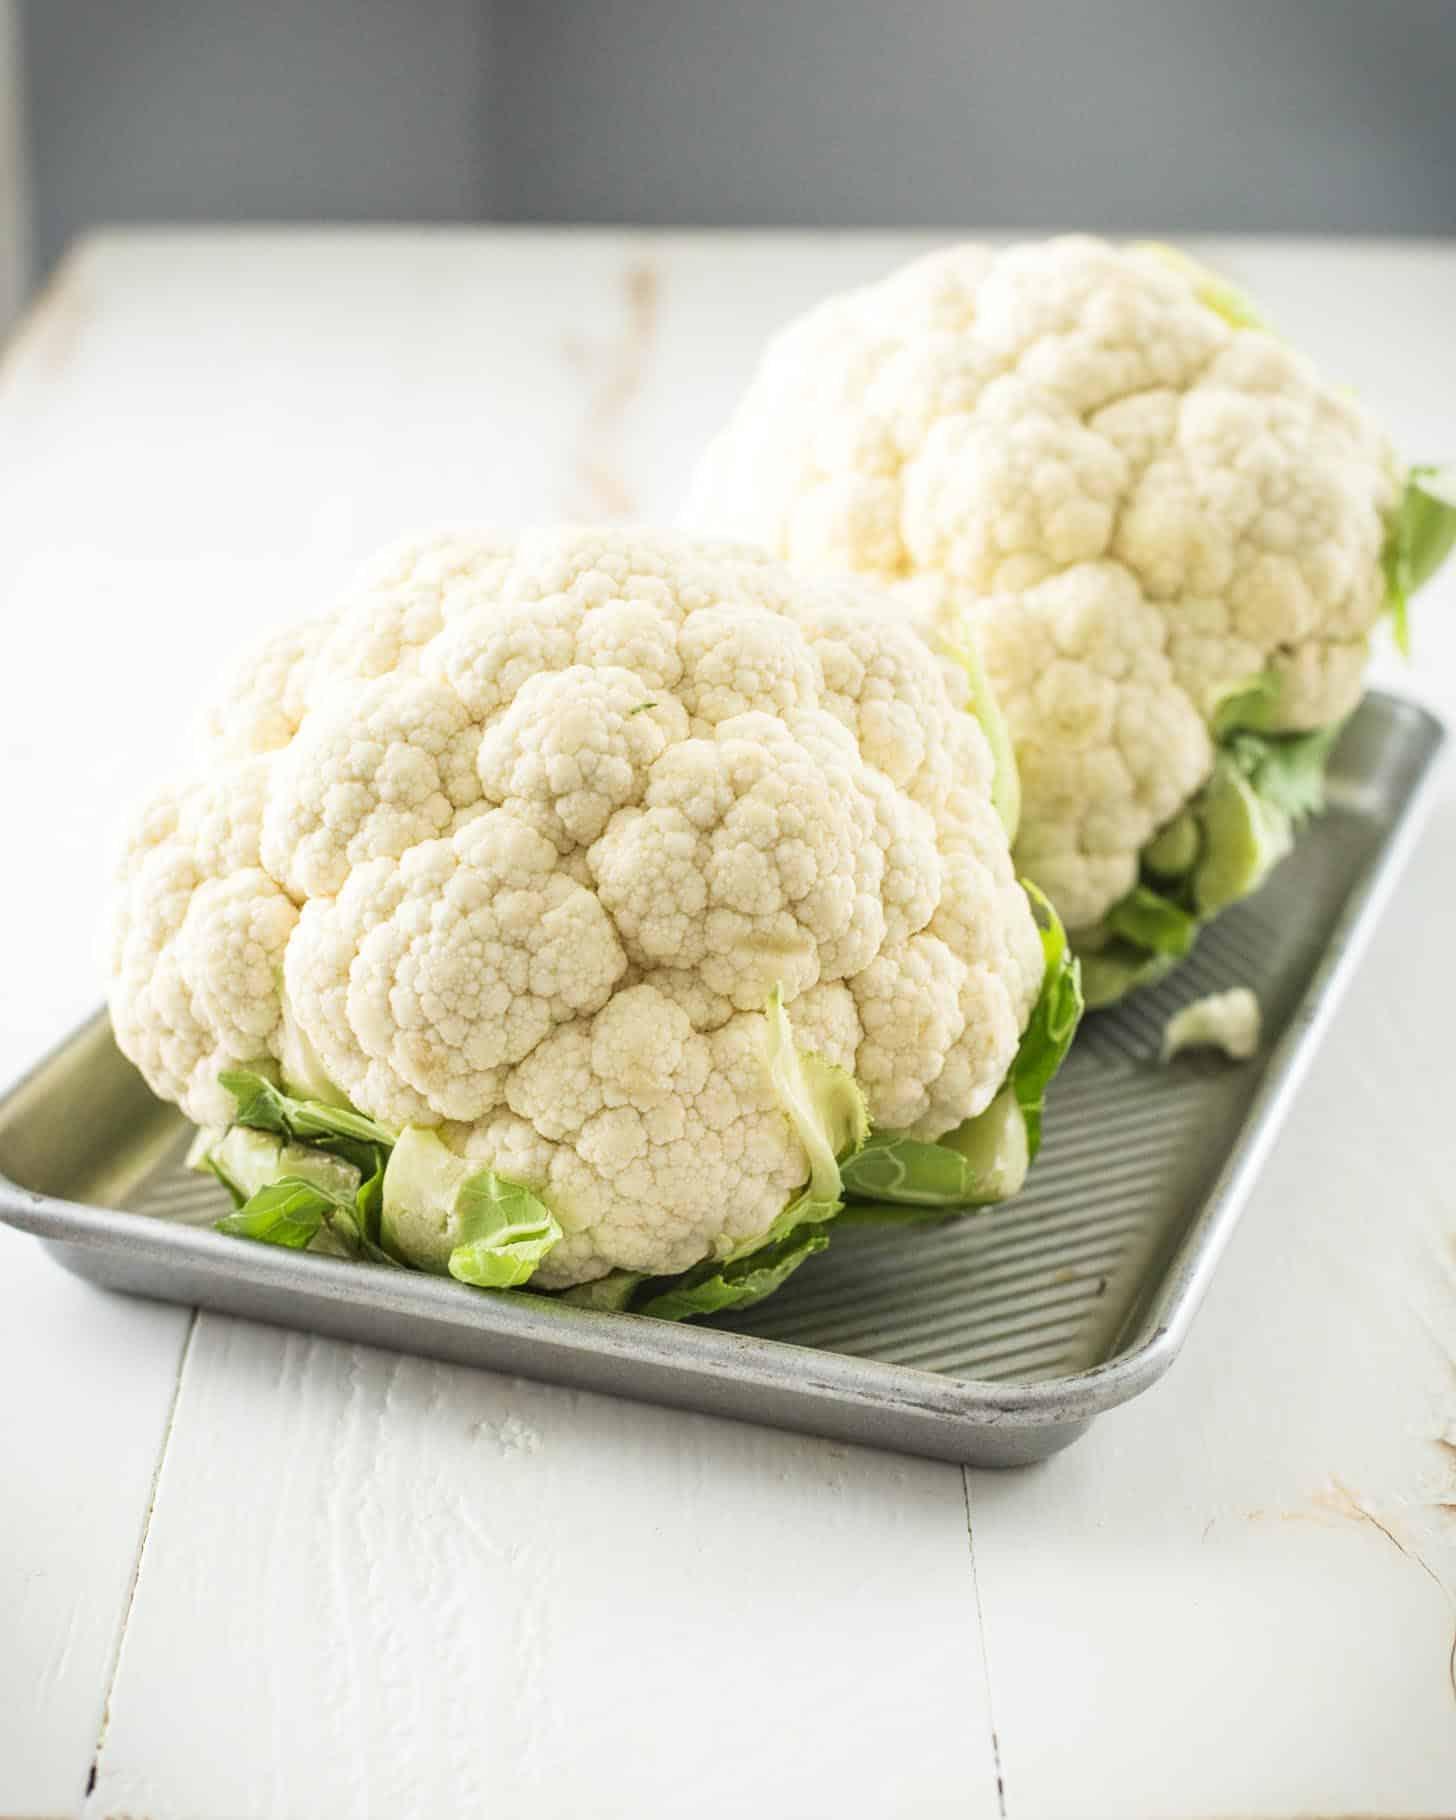 raw cauliflower on a sheet pan